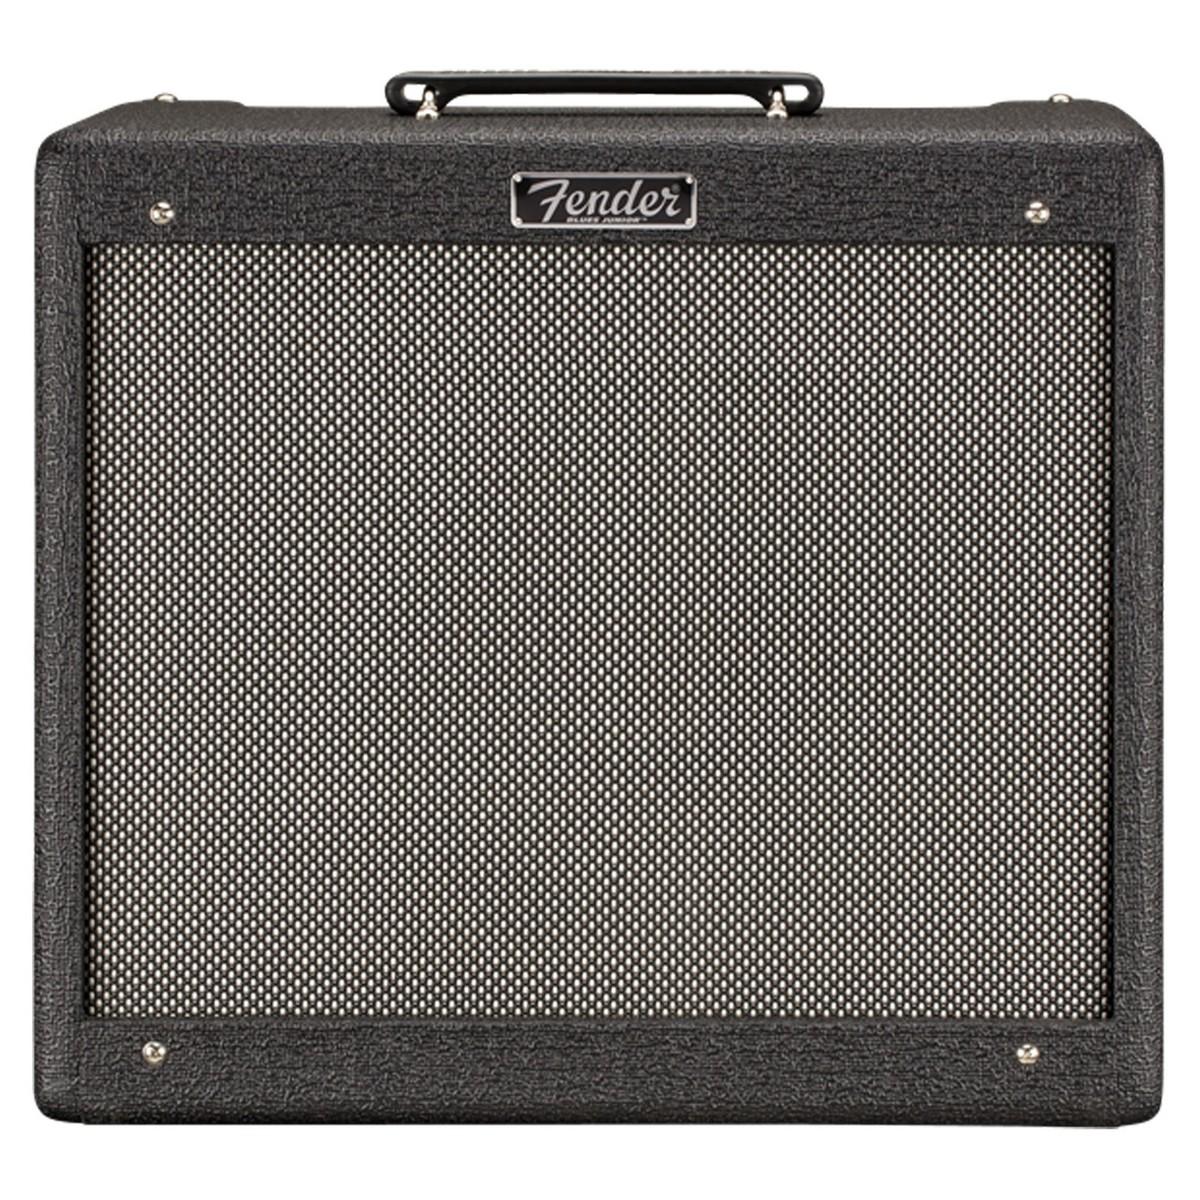 DISC Fender Blues Junior IV Humboldt FSR Combo